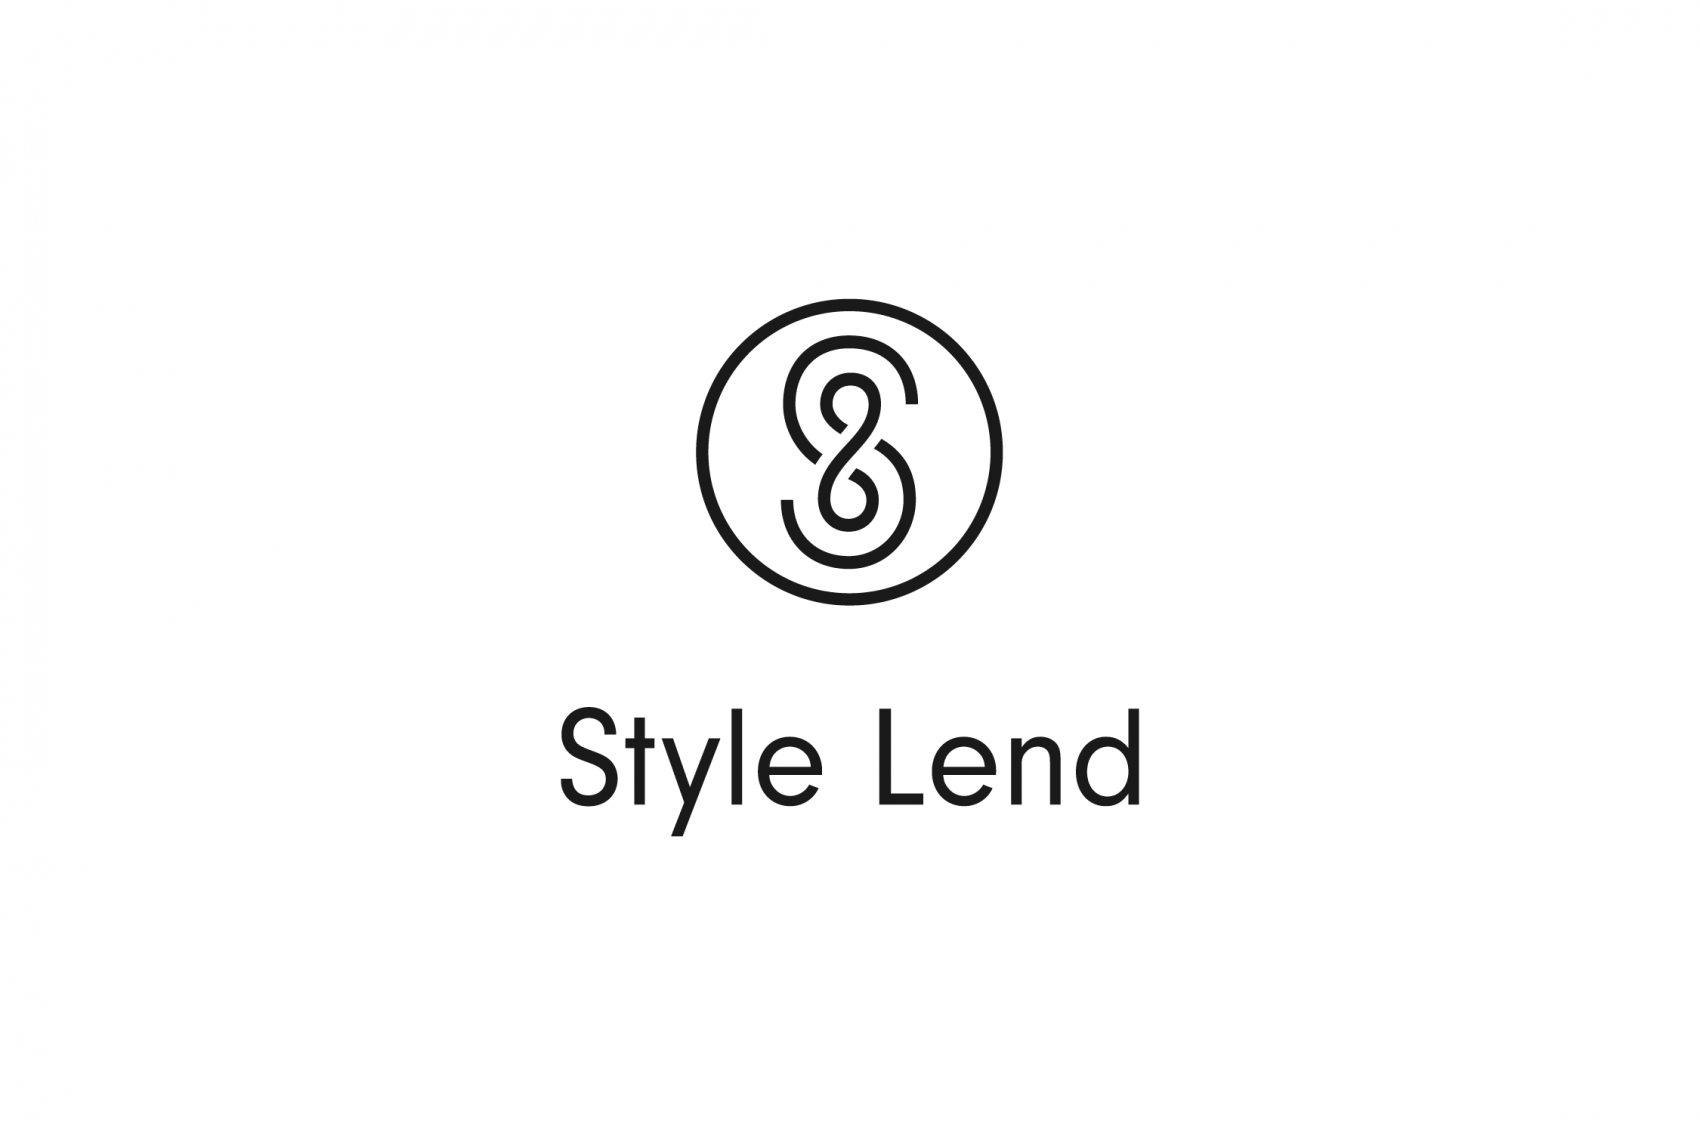 StyleLend